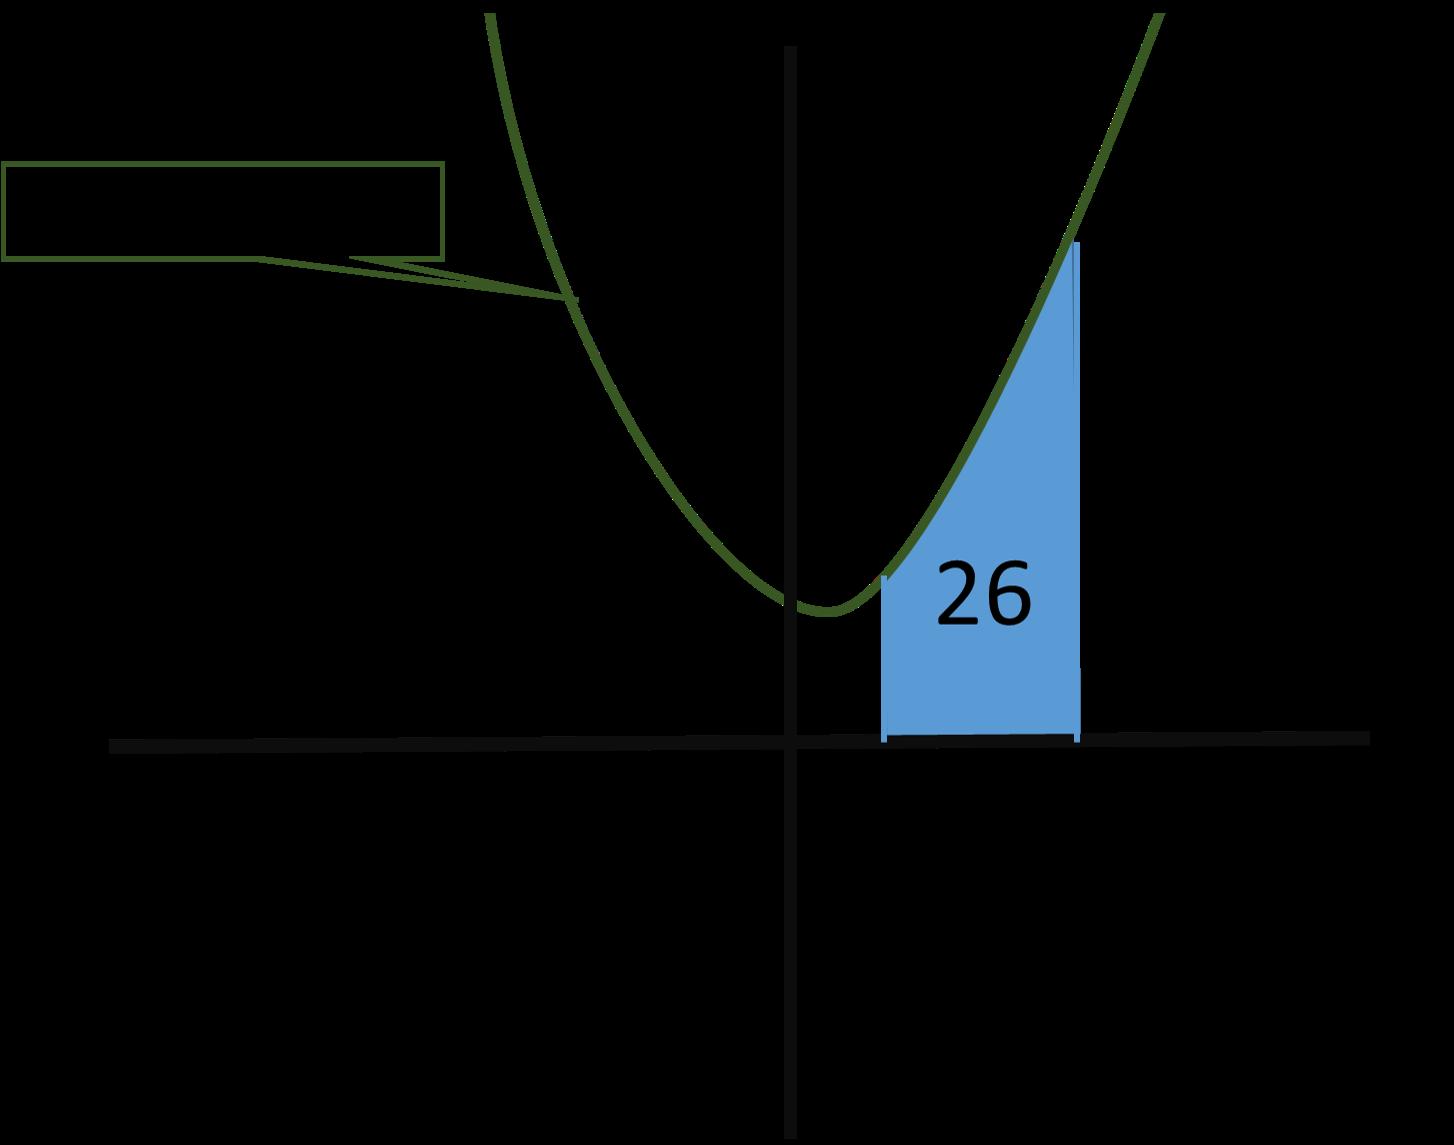 What is the net area between f(x) = 3x^2-x+2 and the x ...